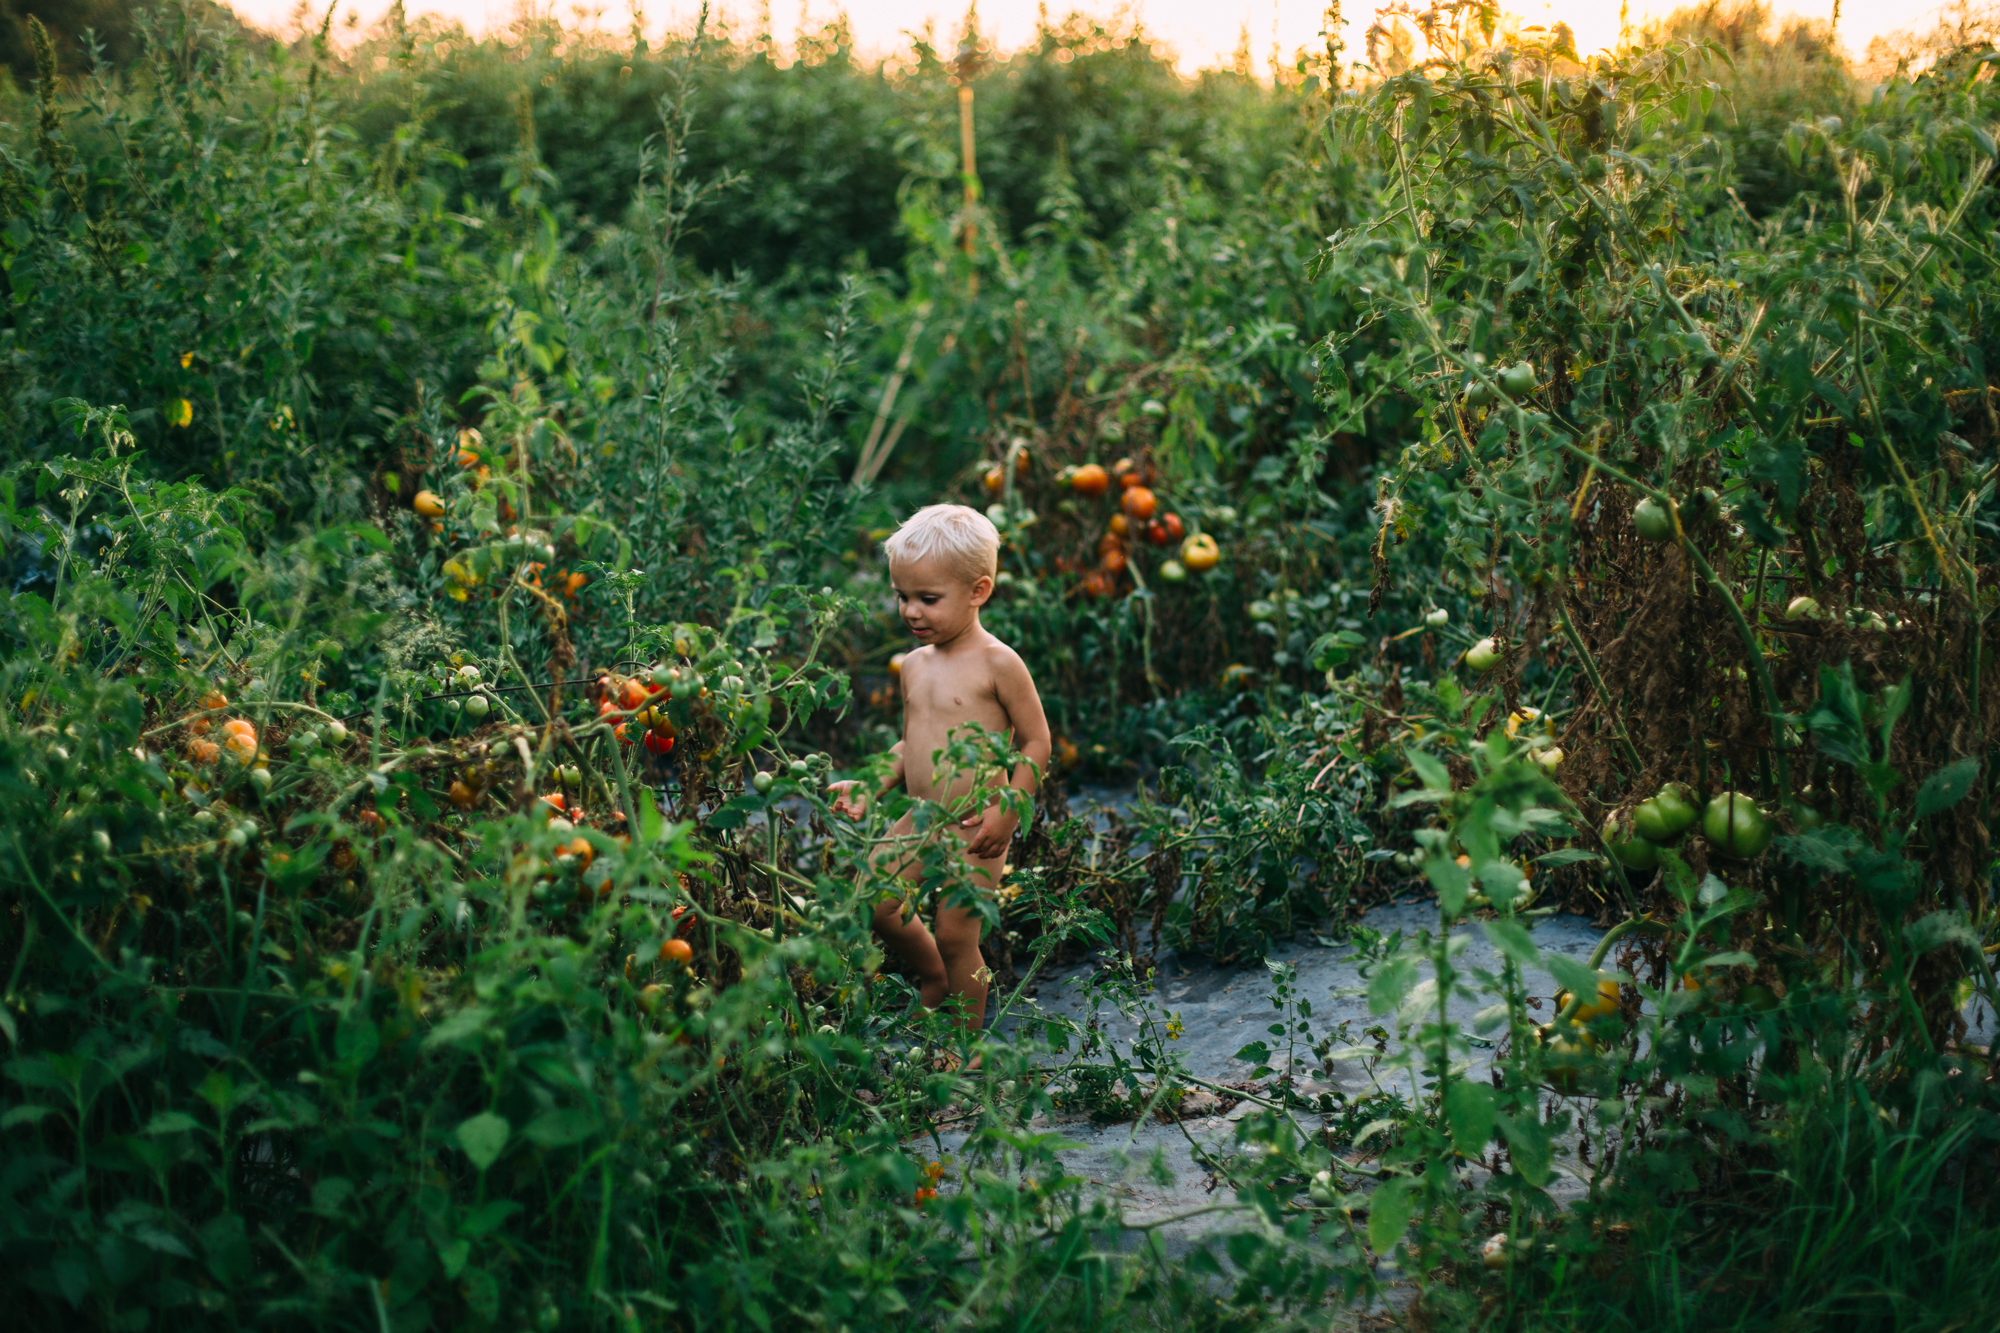 little boy in garden full of tomatoes